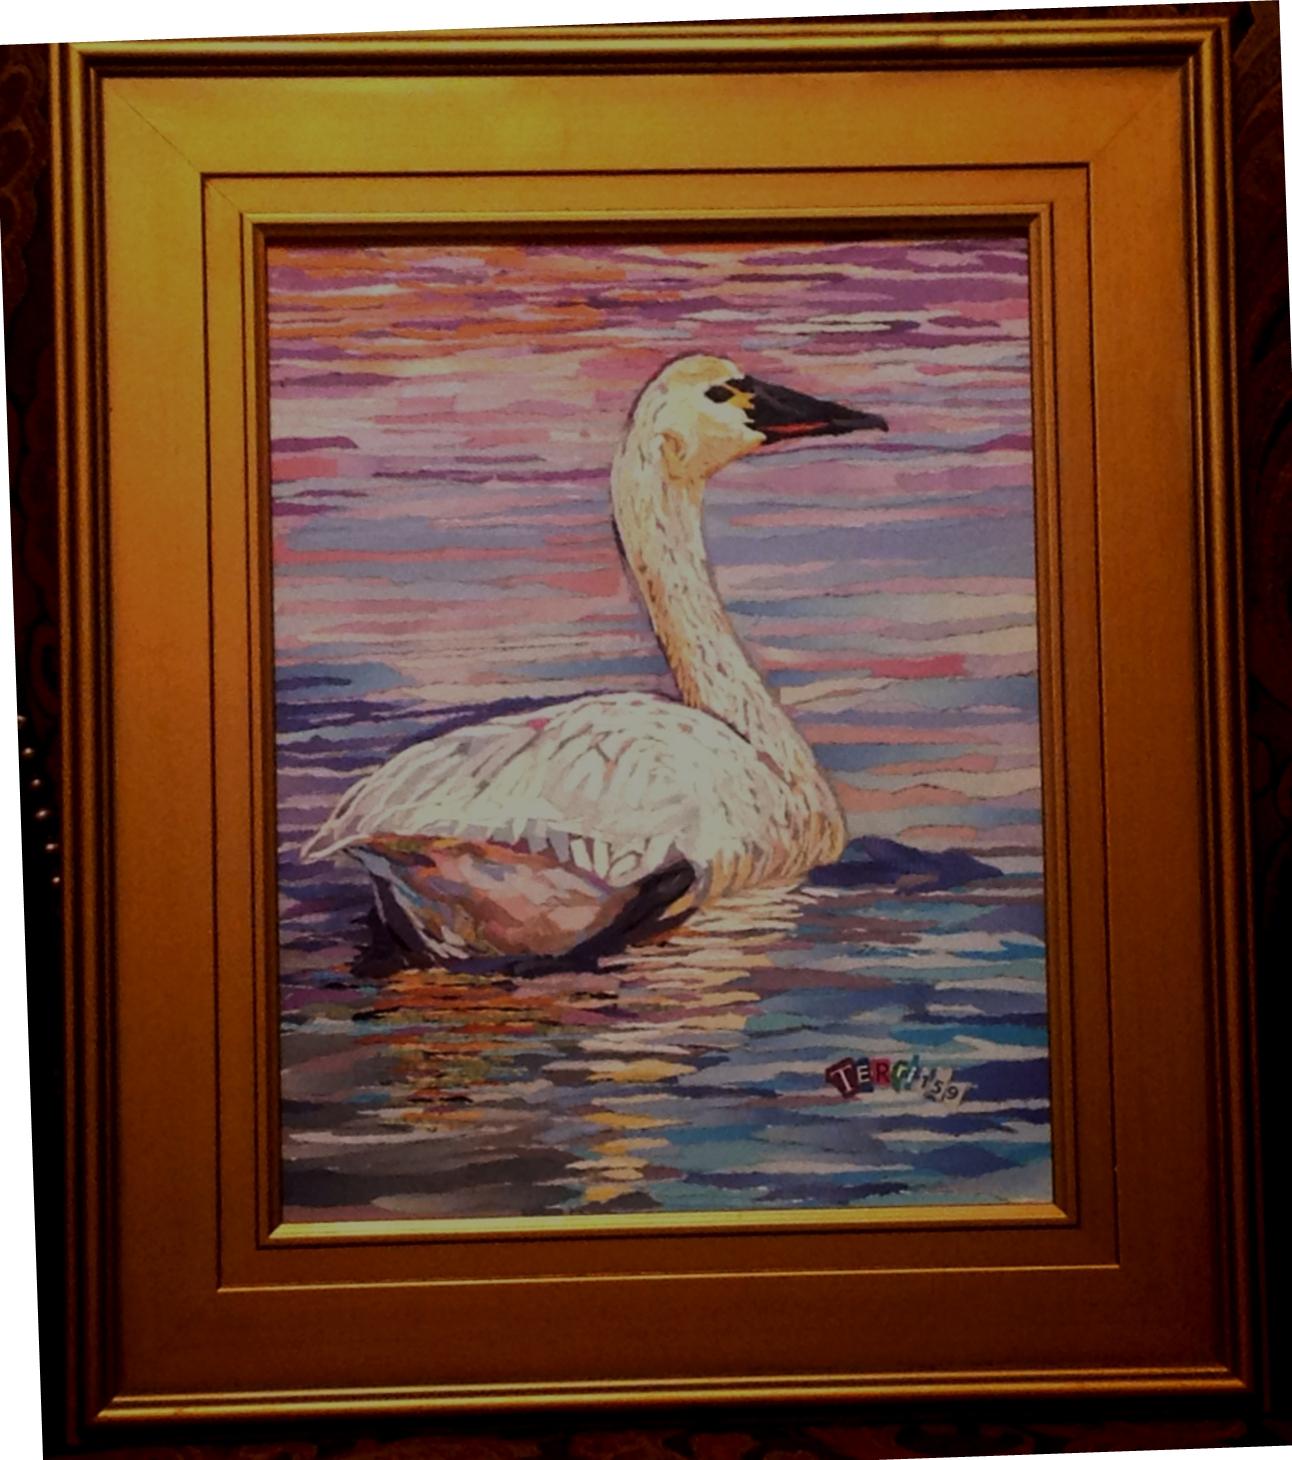 http://1.bp.blogspot.com/-m4HSkULzmbw/UVOdv8whs1I/AAAAAAAAAfM/JbxQoWqo87M/s1600/Torn+Paper+Art+Swan+Paper+Painting.jpg